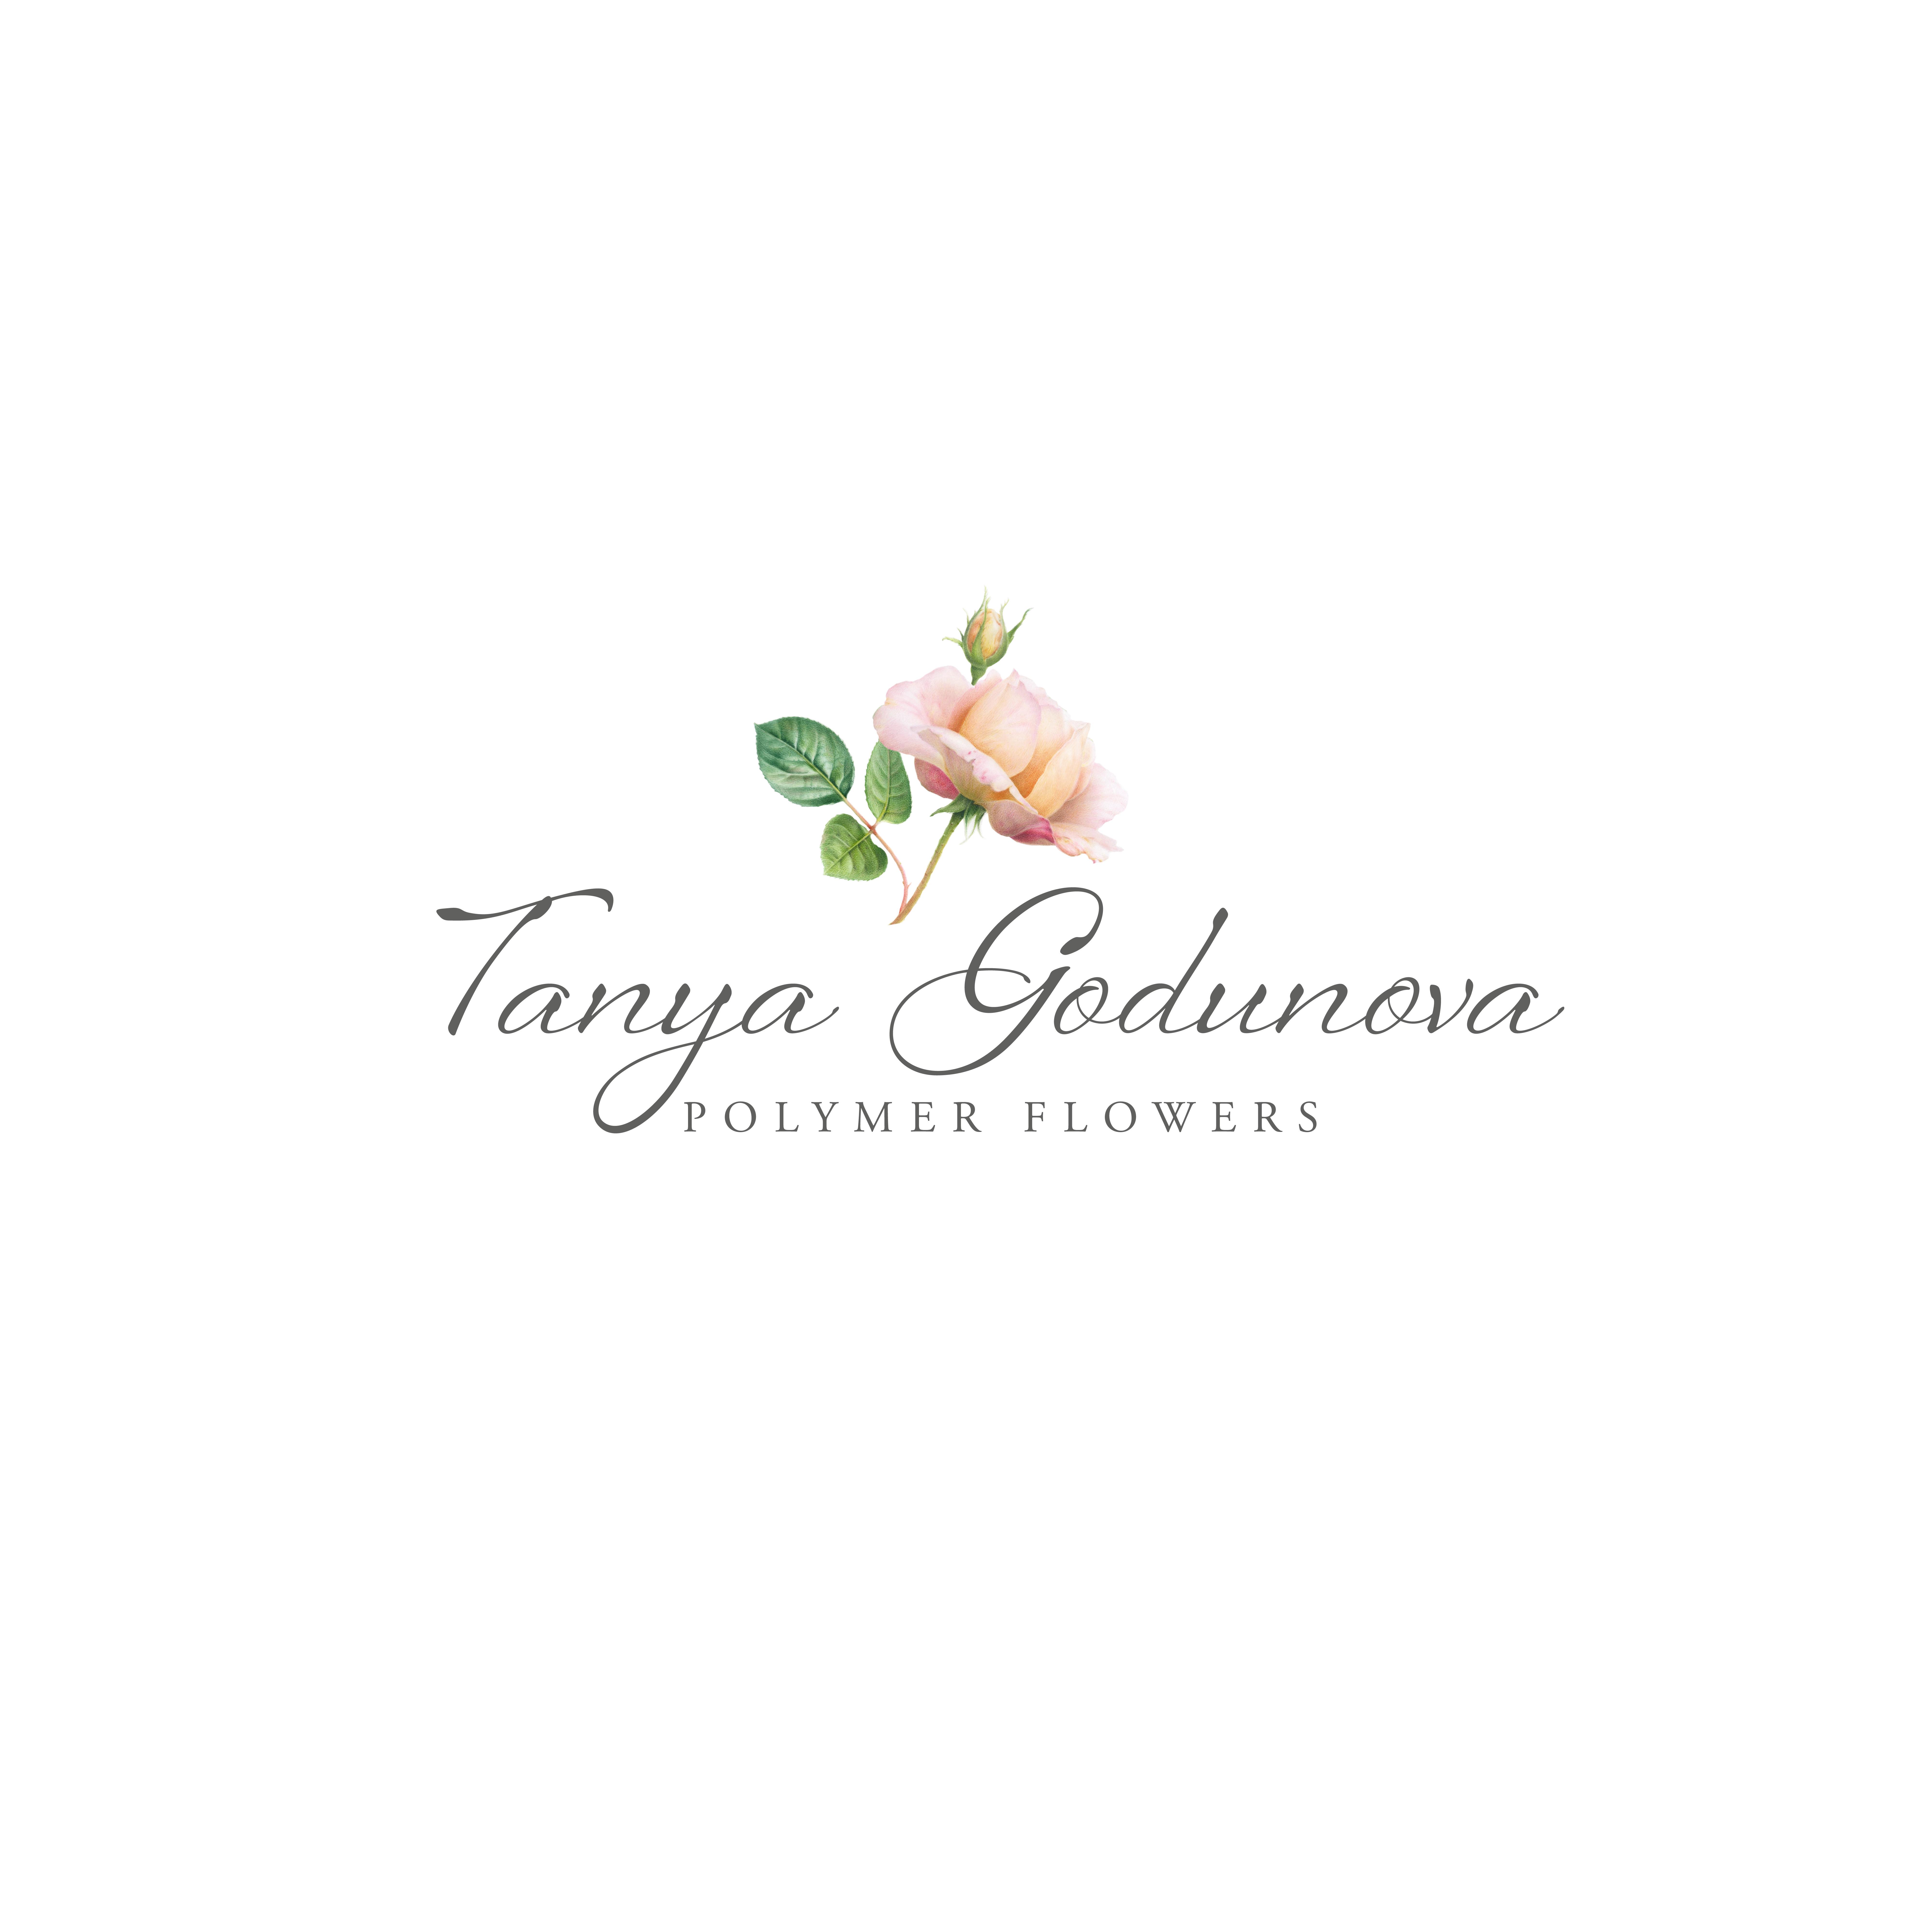 Polymer flowers by Tatiana Godunova undefined classes in London